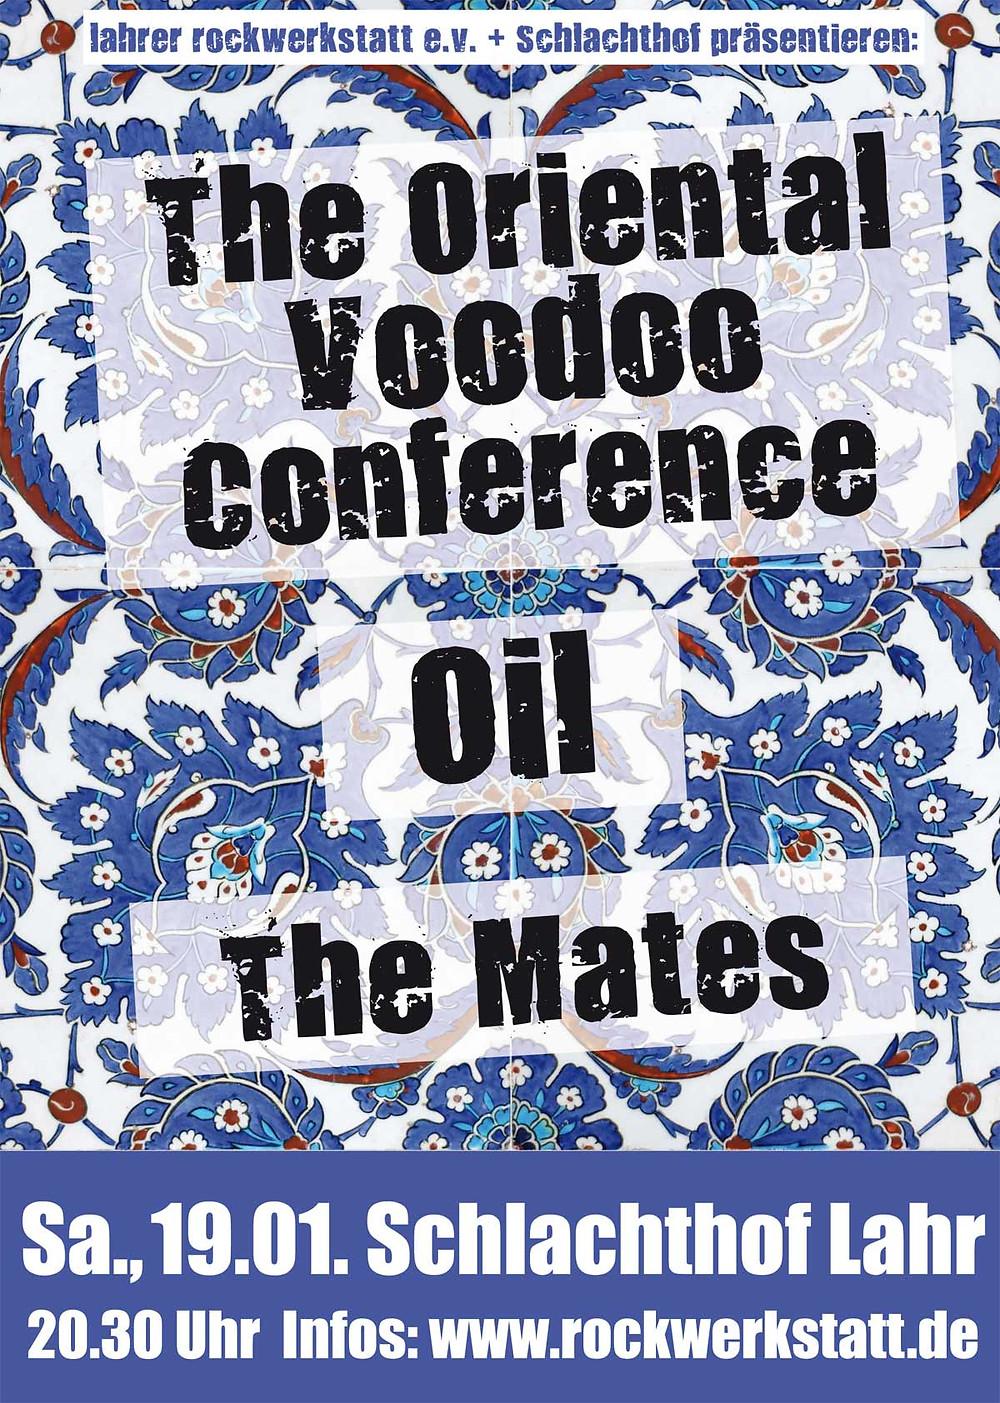 OIL, Oriental Voodoo Conference & The Mates - Plakat Rockwerkstatt Lahr